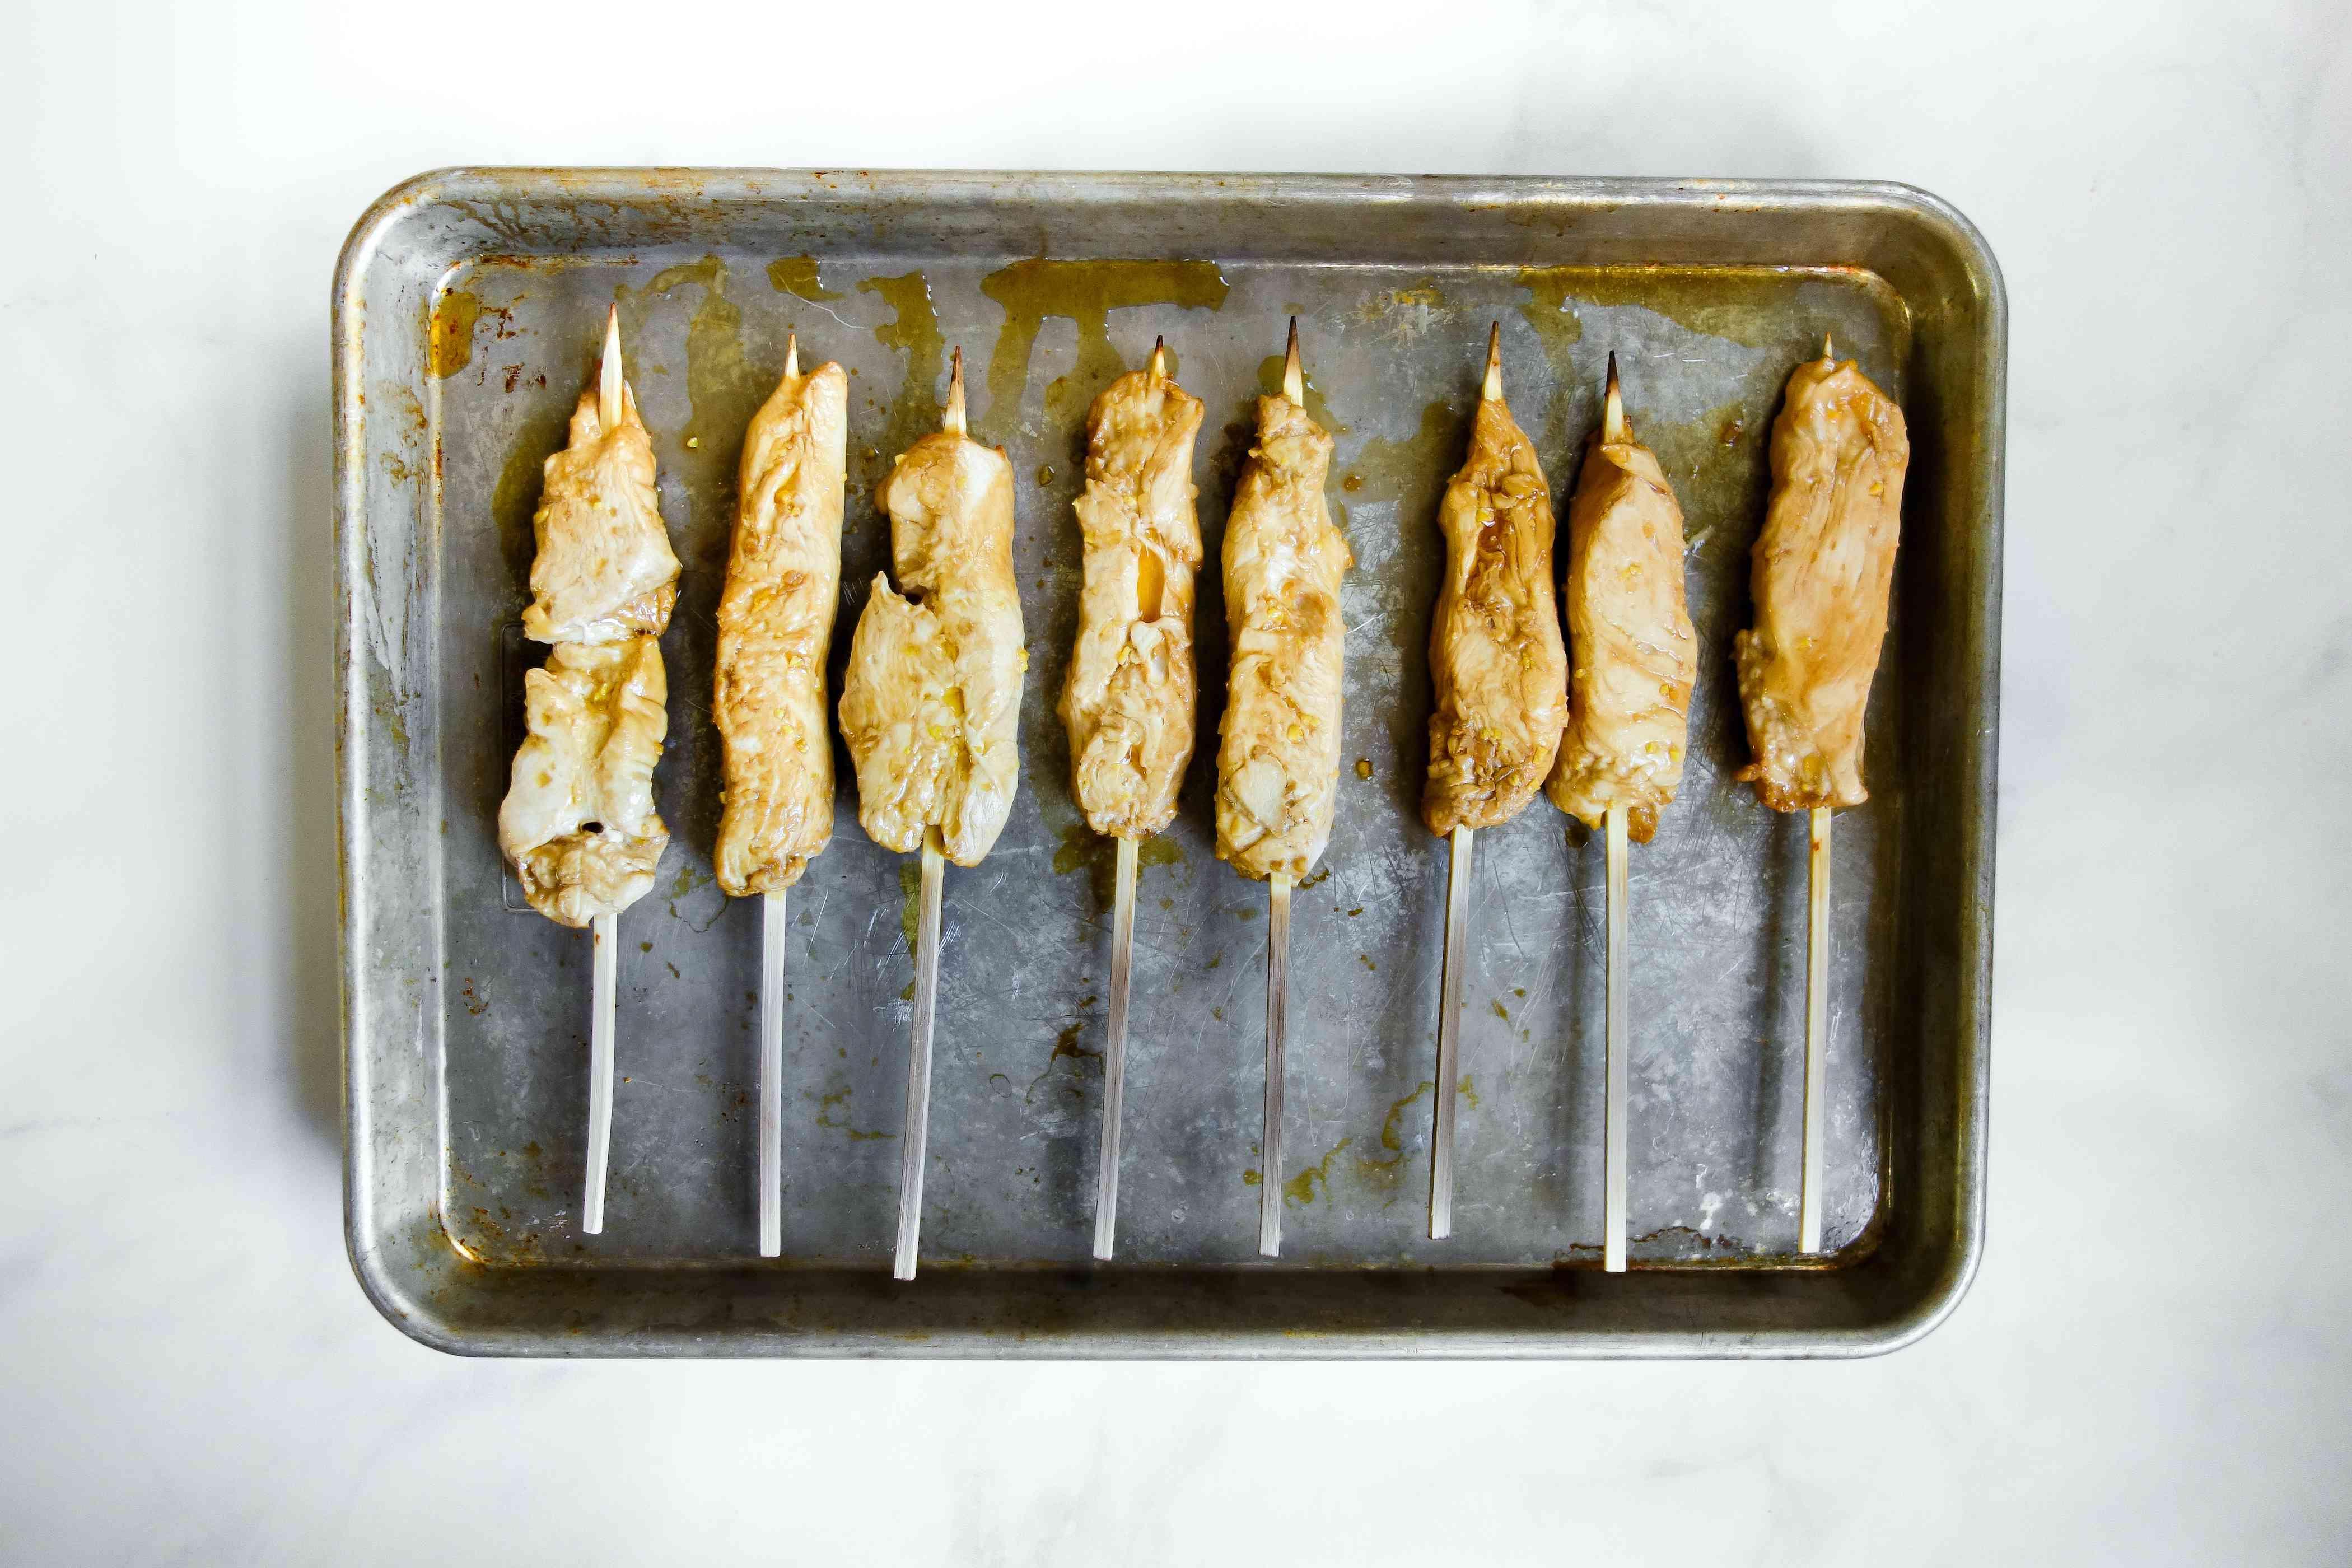 chicken on a baking sheet